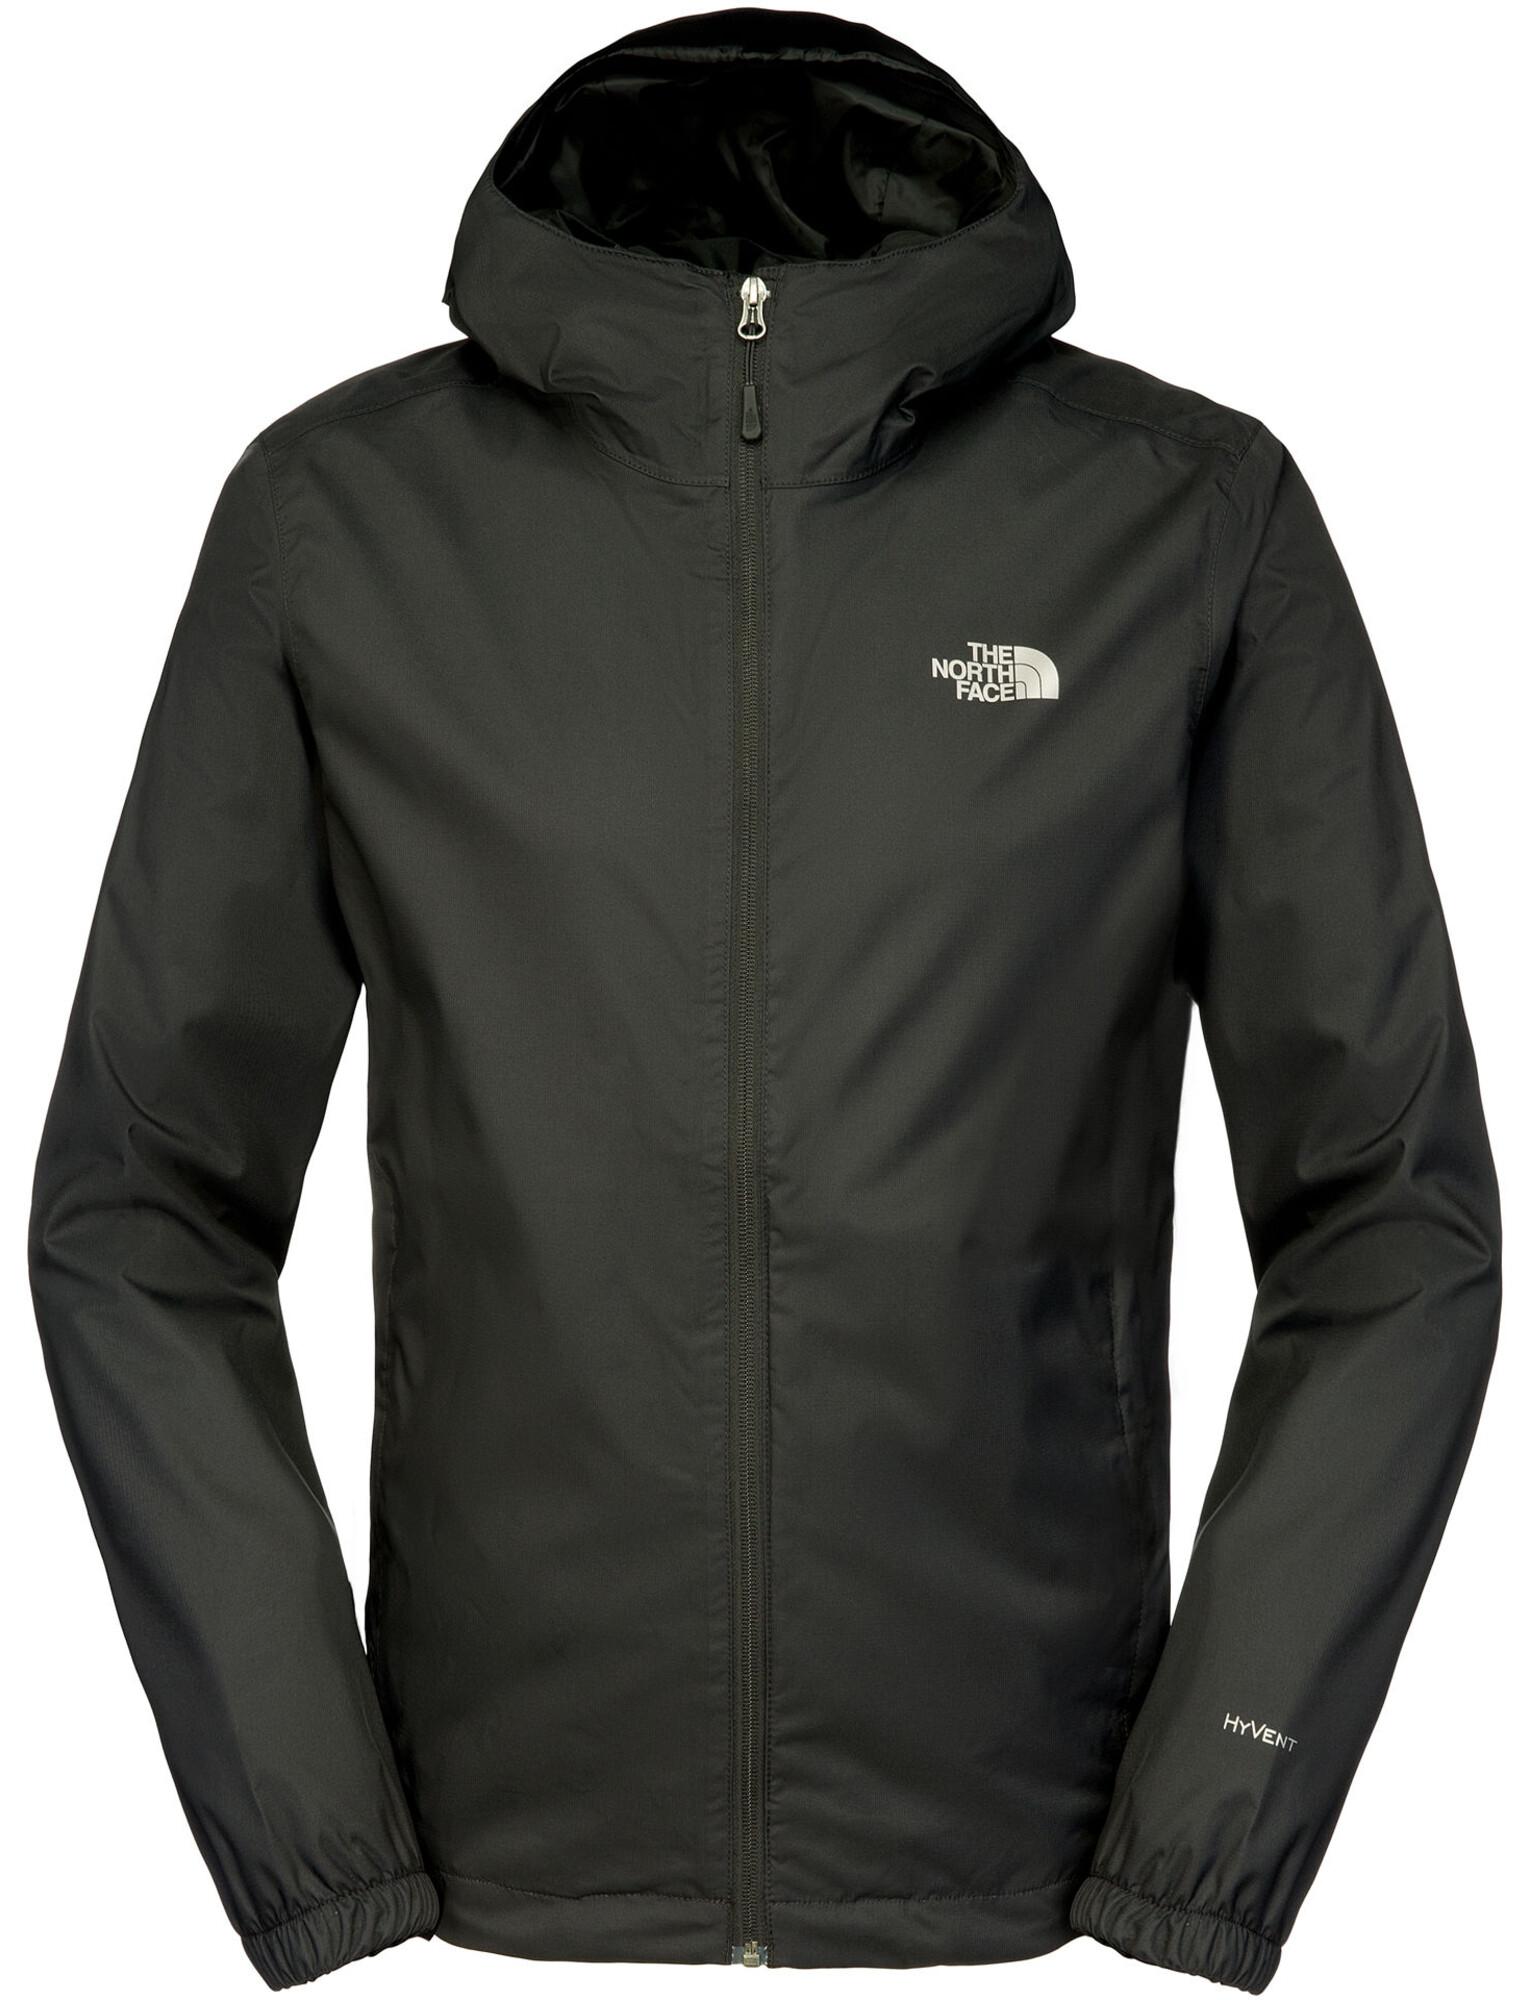 055567bba49 The North Face Quest Jas Heren, tnf black l Online outdoor shop Campz.nl